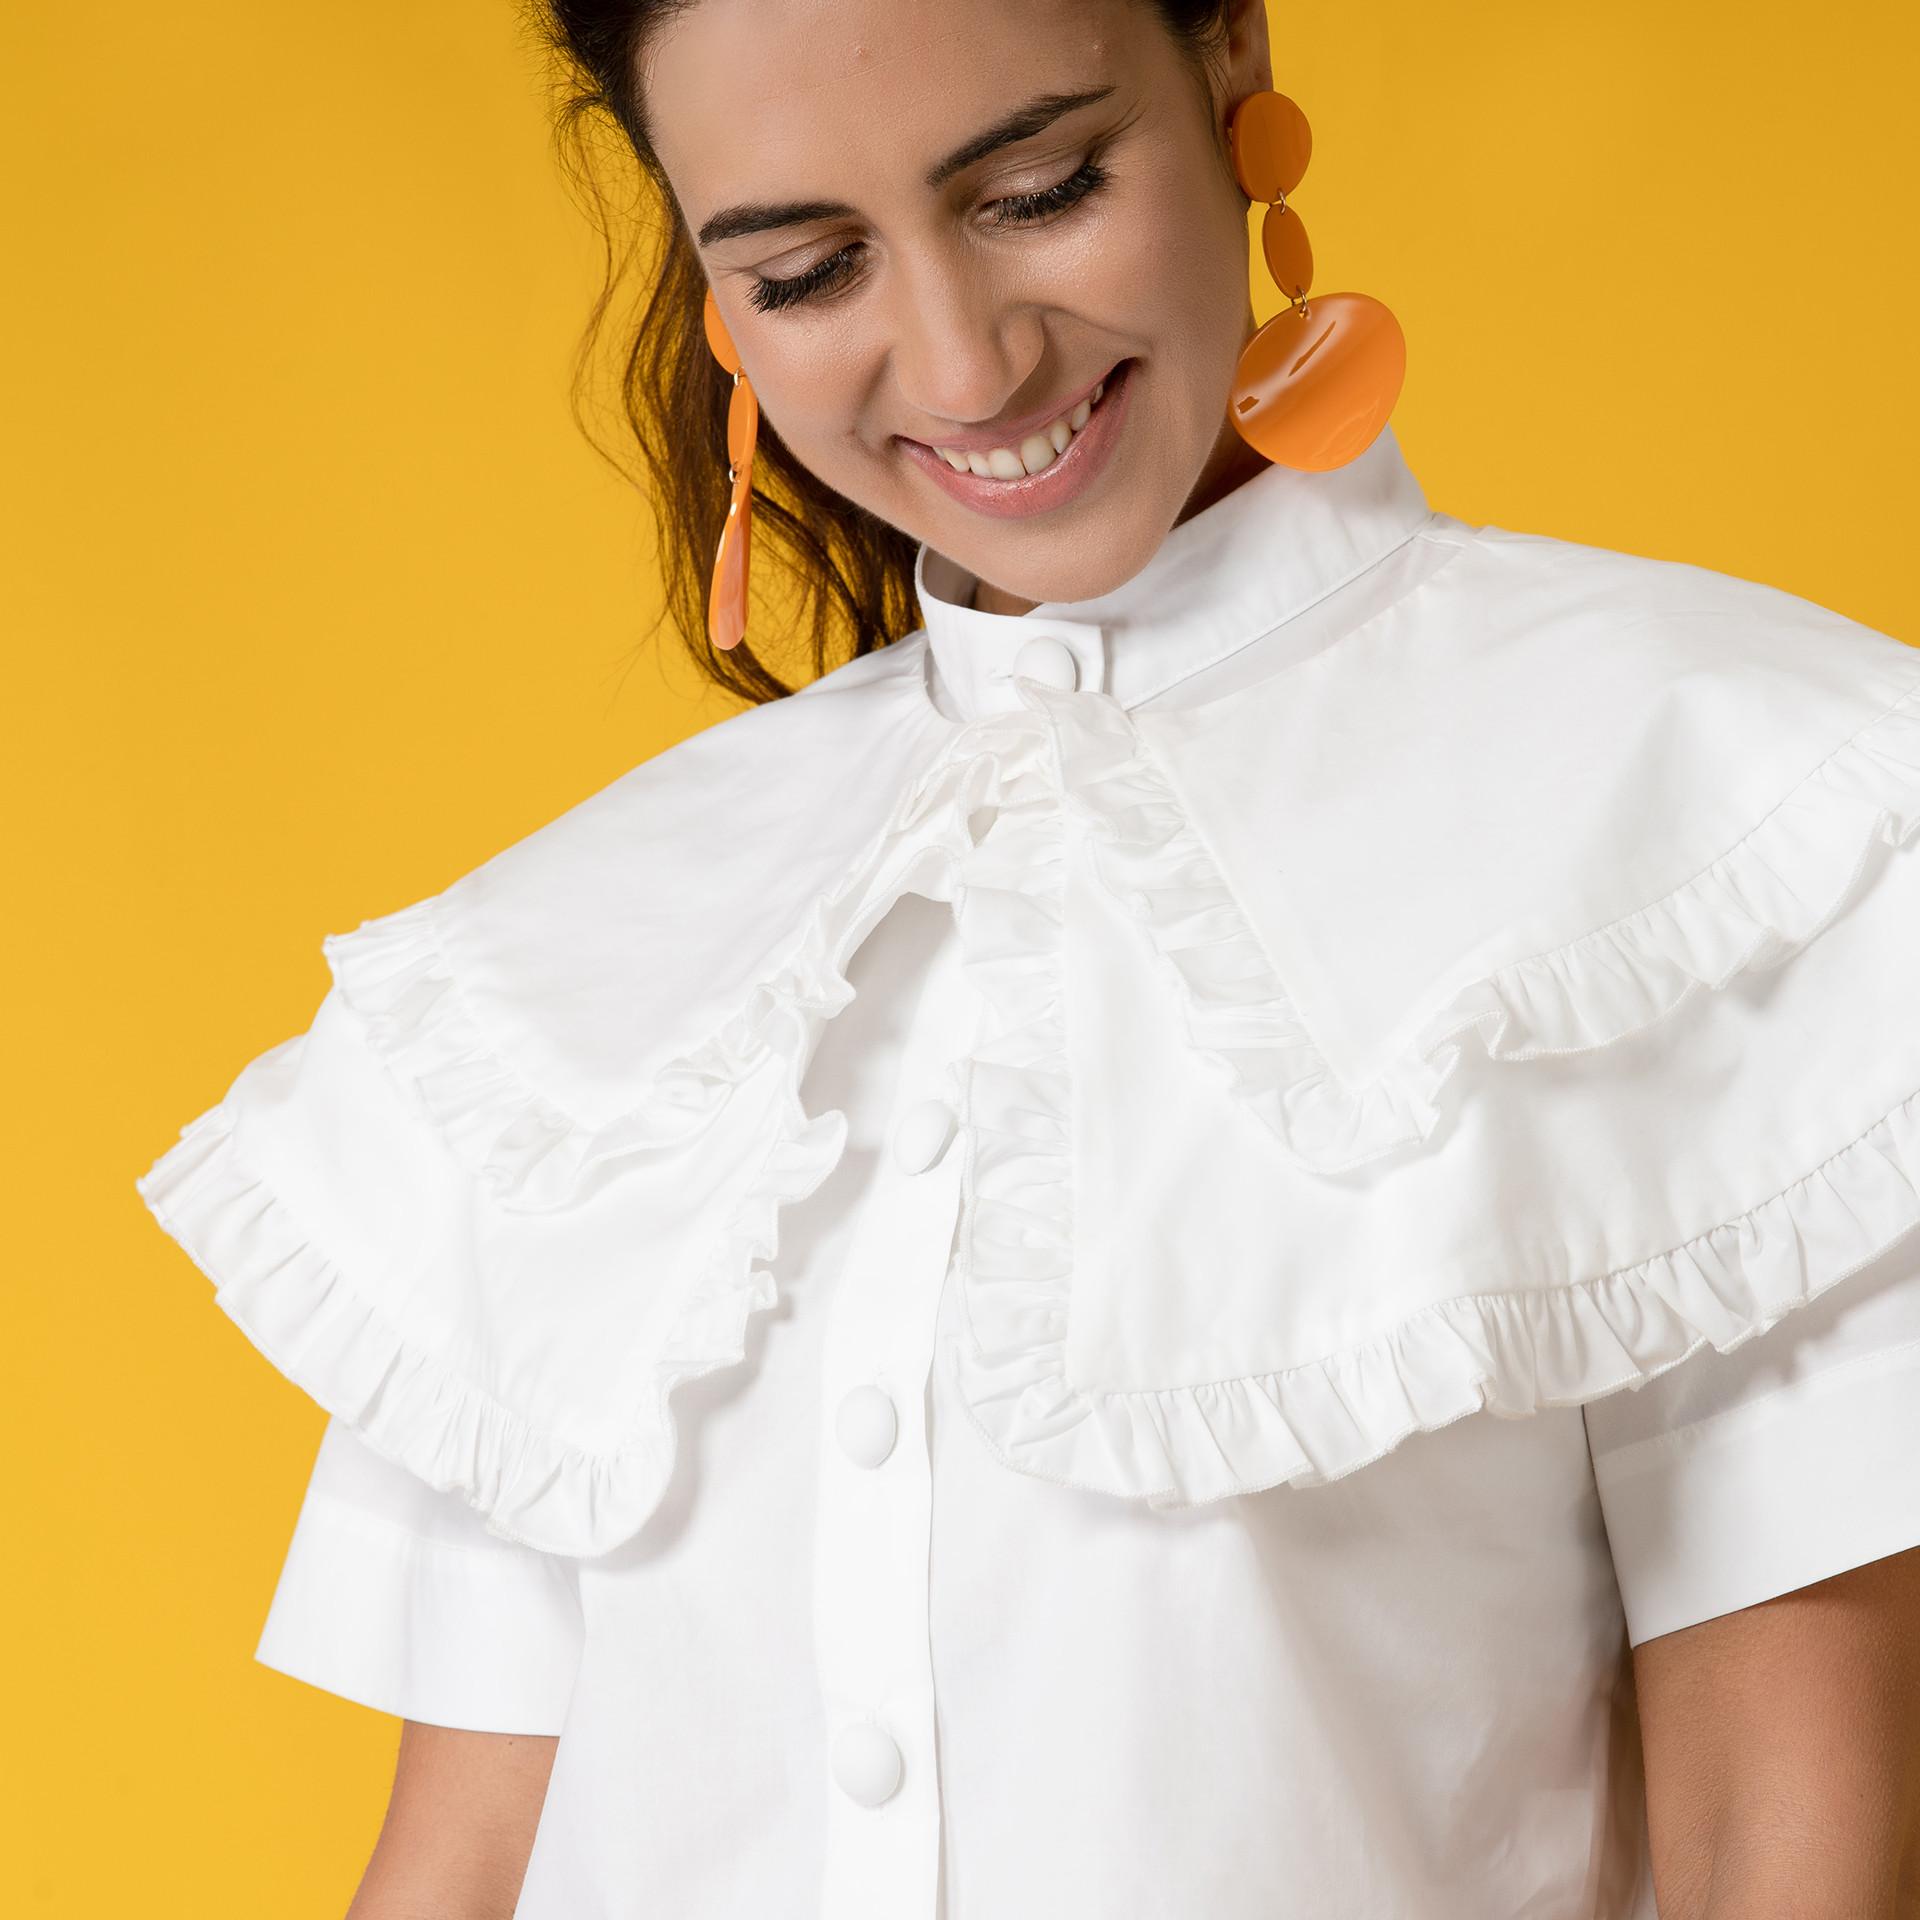 Fashion_Editorial_MissesWhiteSS19_4.jpg